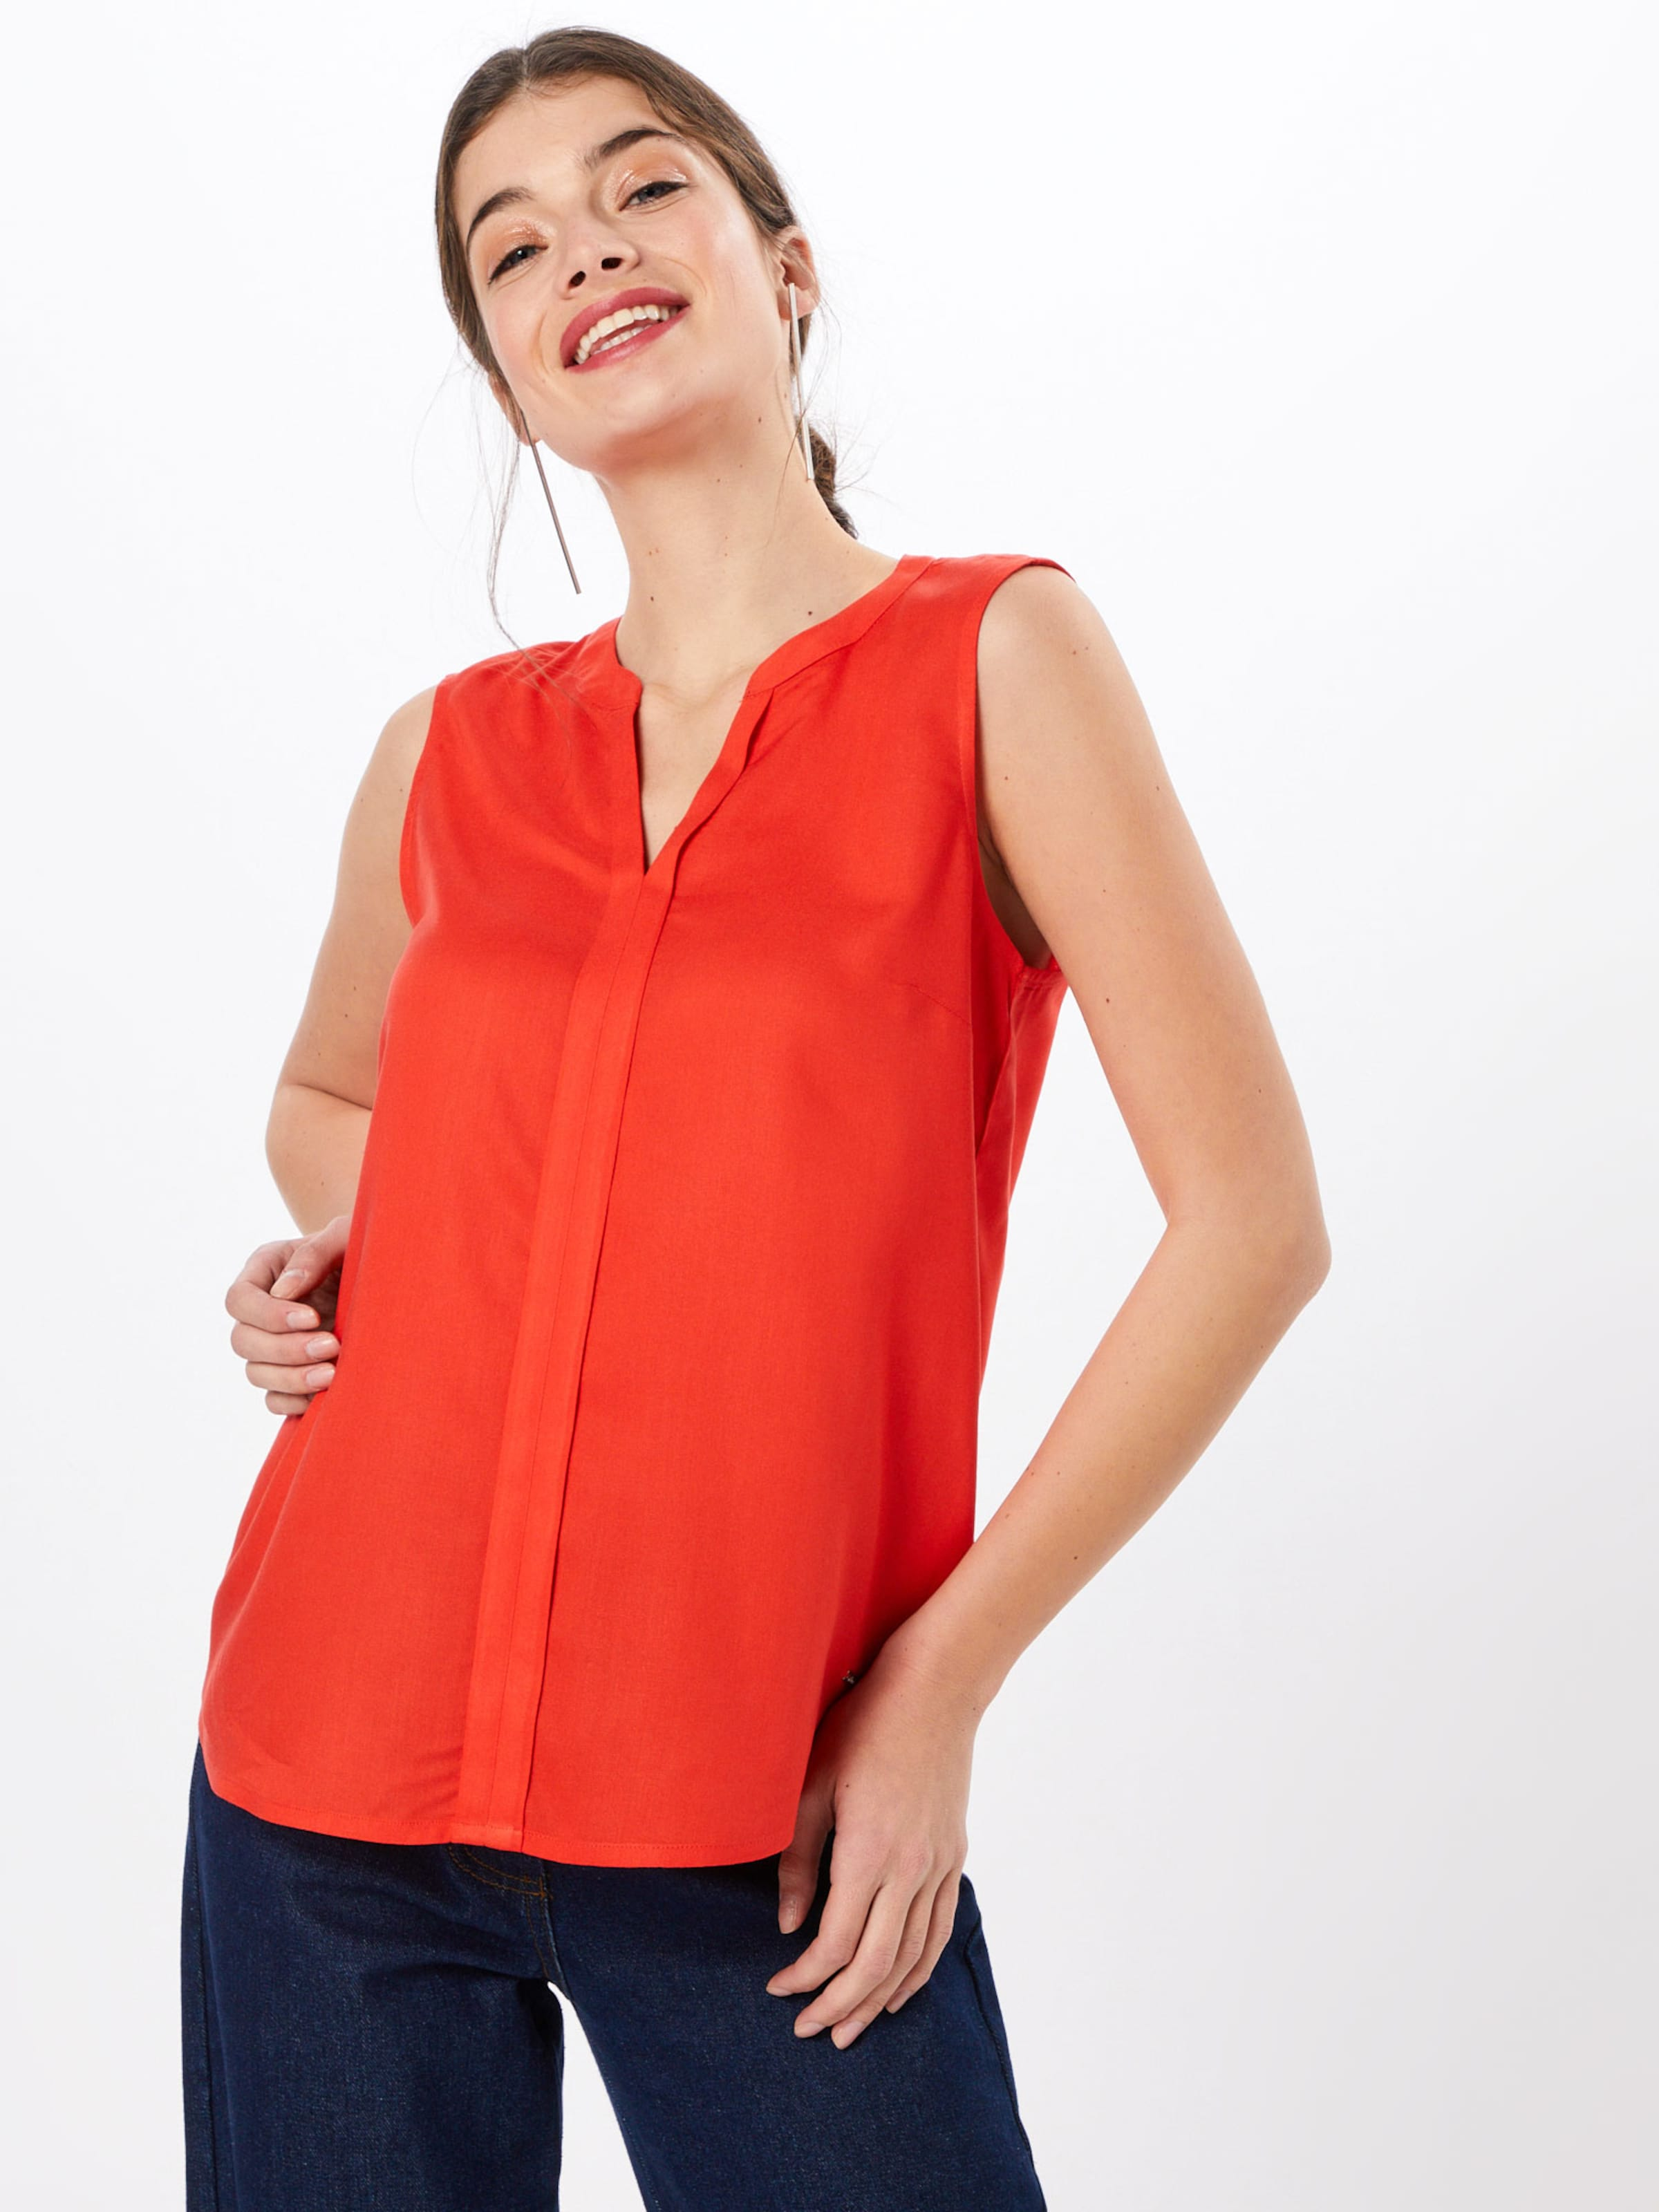 Orangerot Tom Denim Bluse Tailor In 0wknOP8X